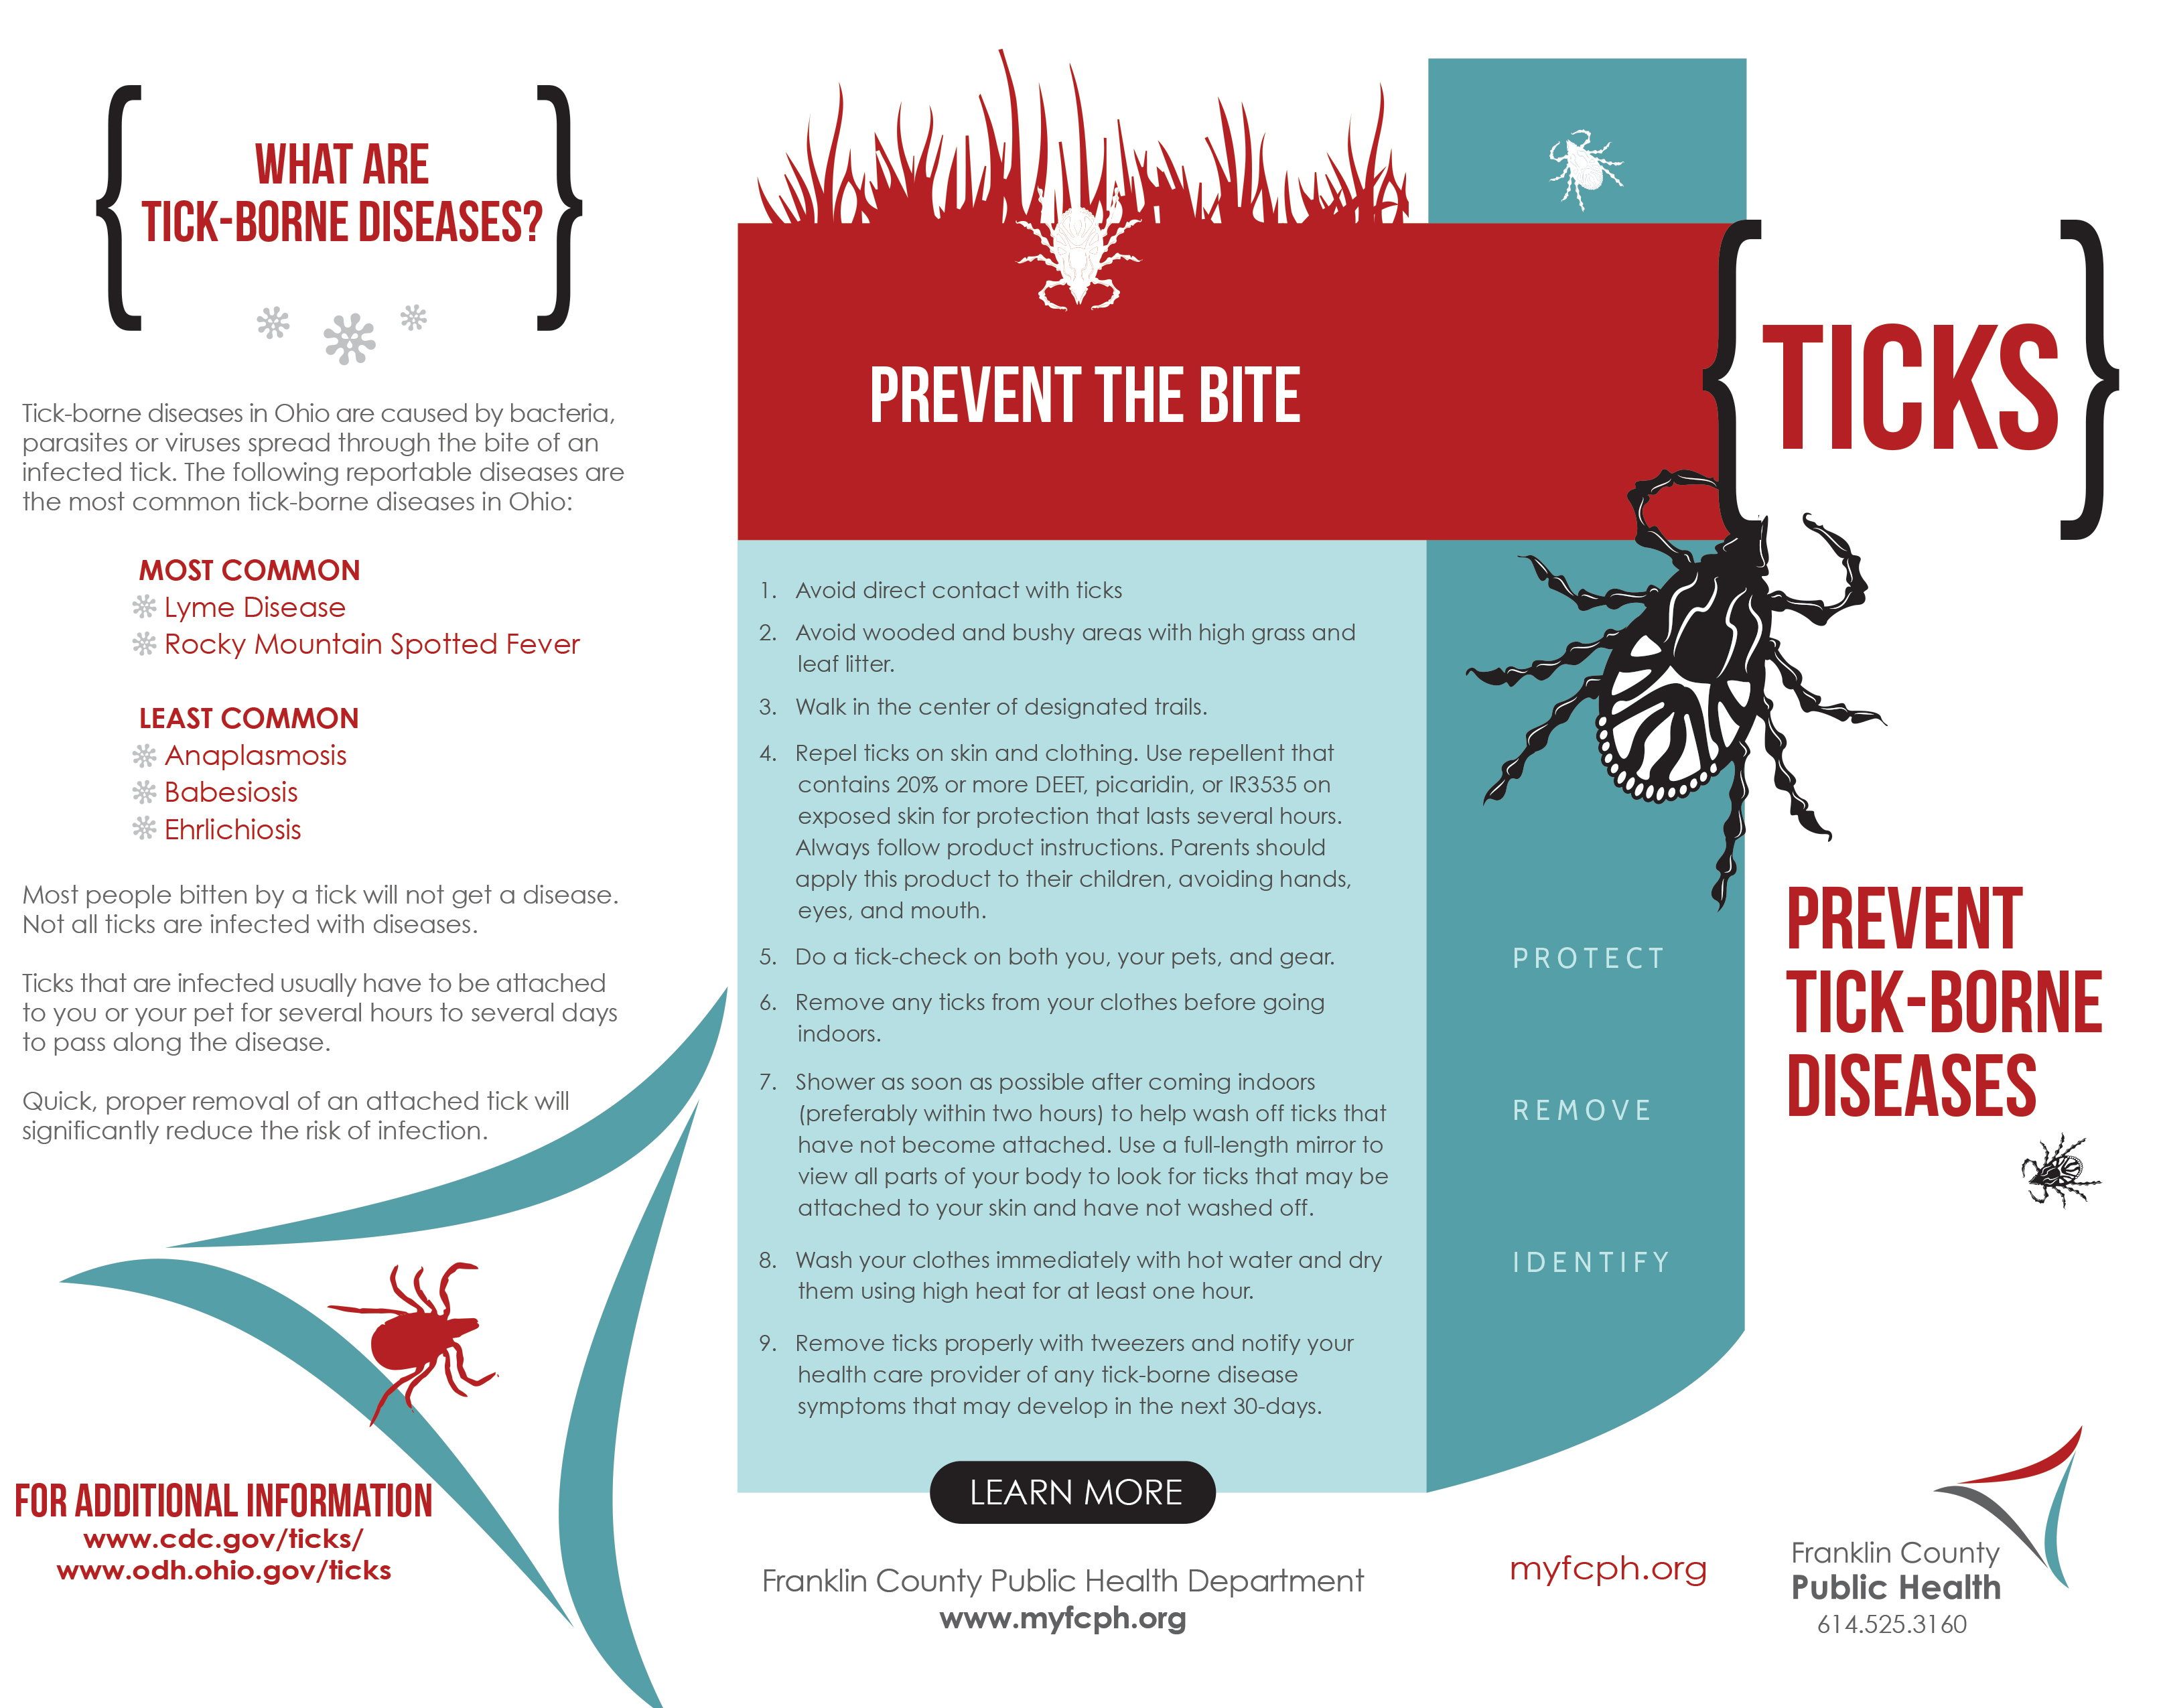 Ticks Franklin County Public Health